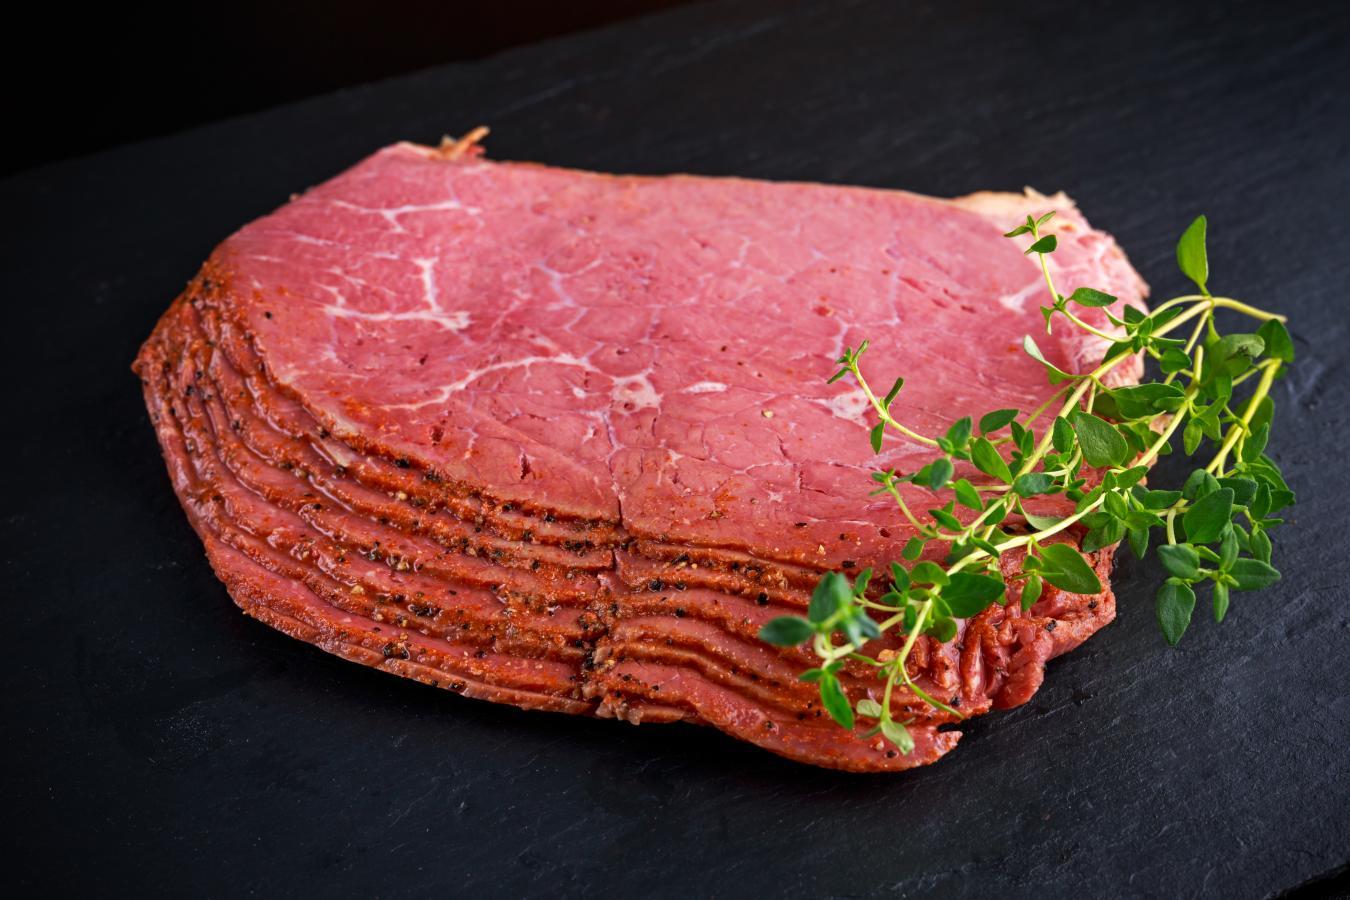 Sliced Deli Corned Beef